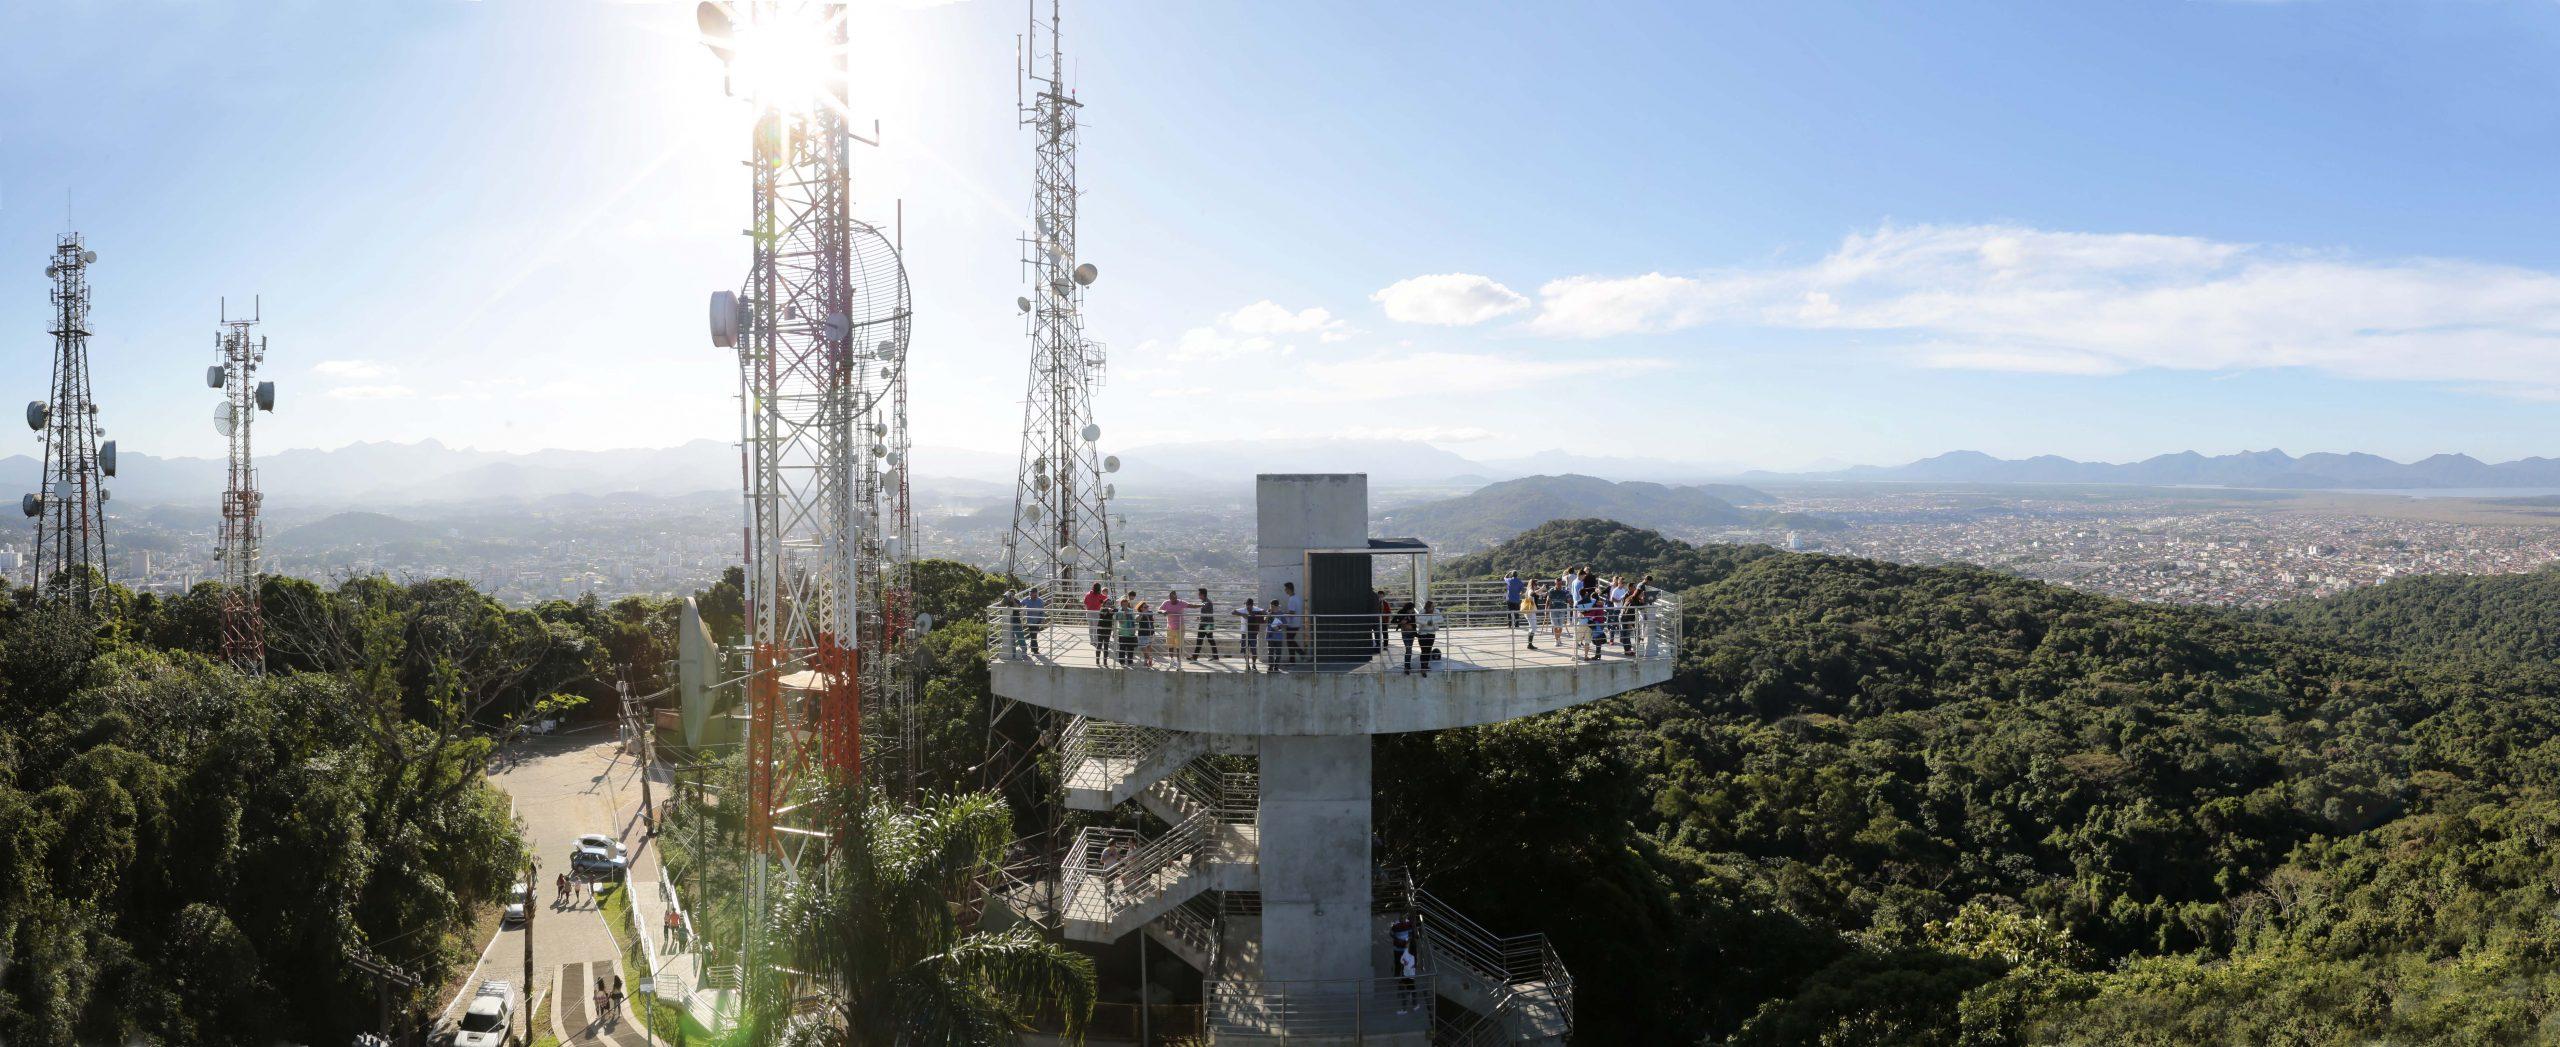 Mirante de Joinville – Foto: Rogerio da Silva | Prefeitura Municipal de Joinville/Divulgação